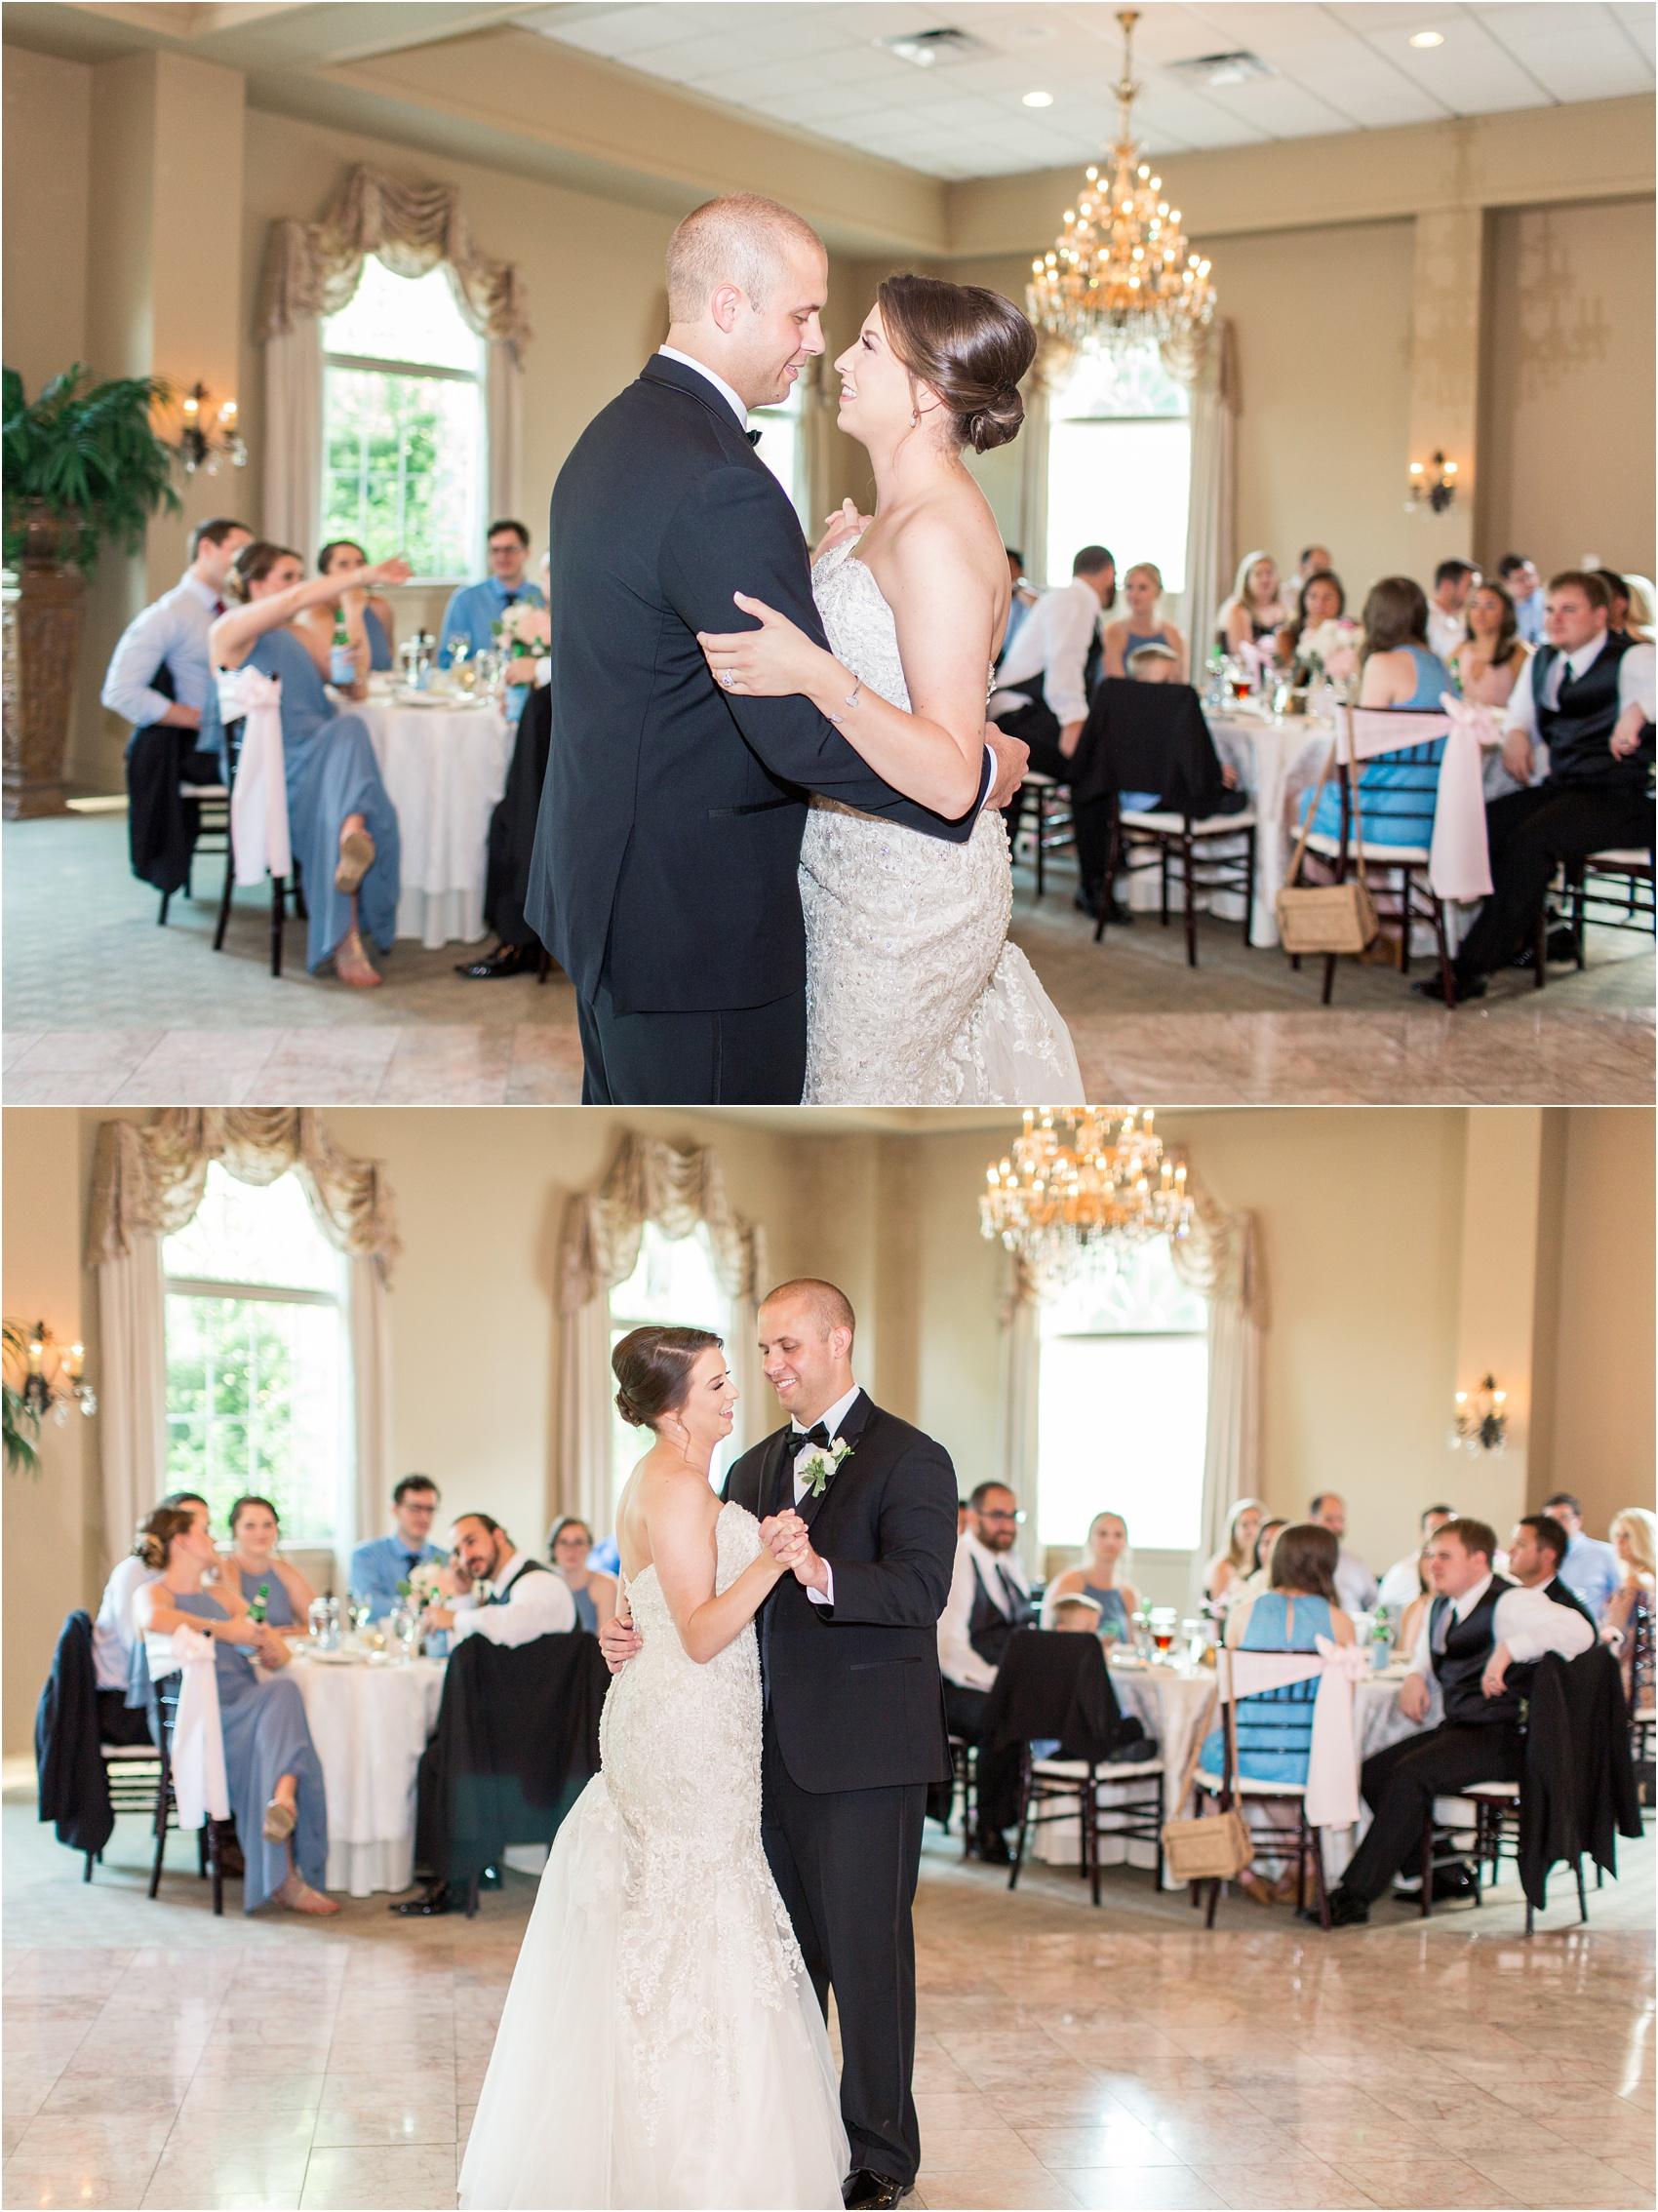 Savannah Eve Photography- Nutt Wedding- Blog-105.jpg